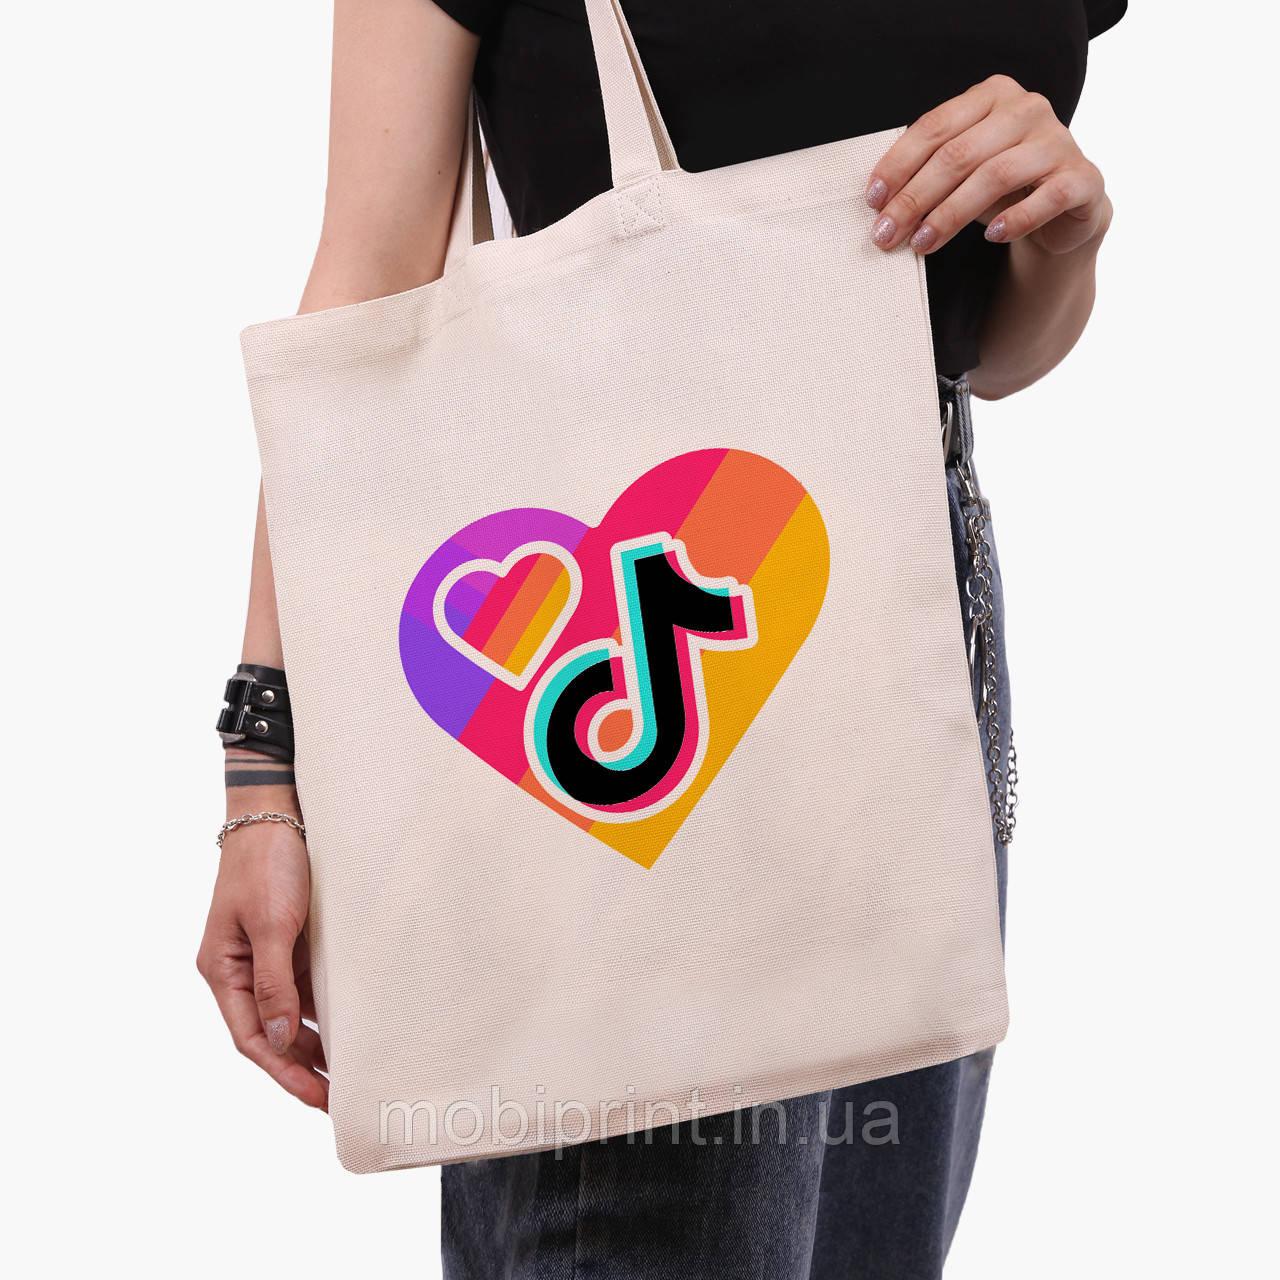 Еко сумка шоппер ТикТок (TikTok) (9227-1559) 41*35 см